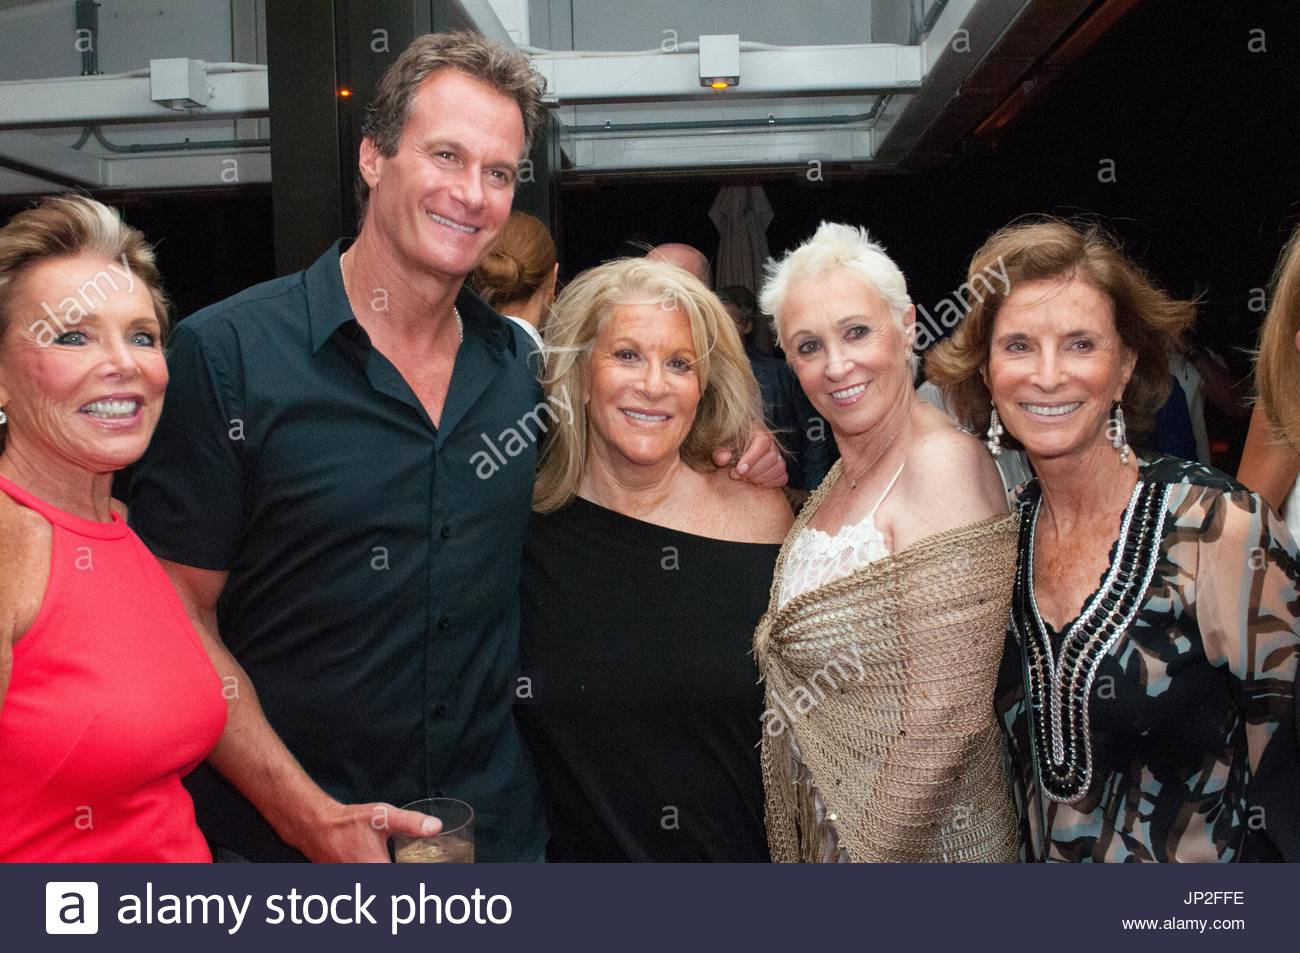 Celebrity Photos, Celebrity Pictures, Celebrity Pics